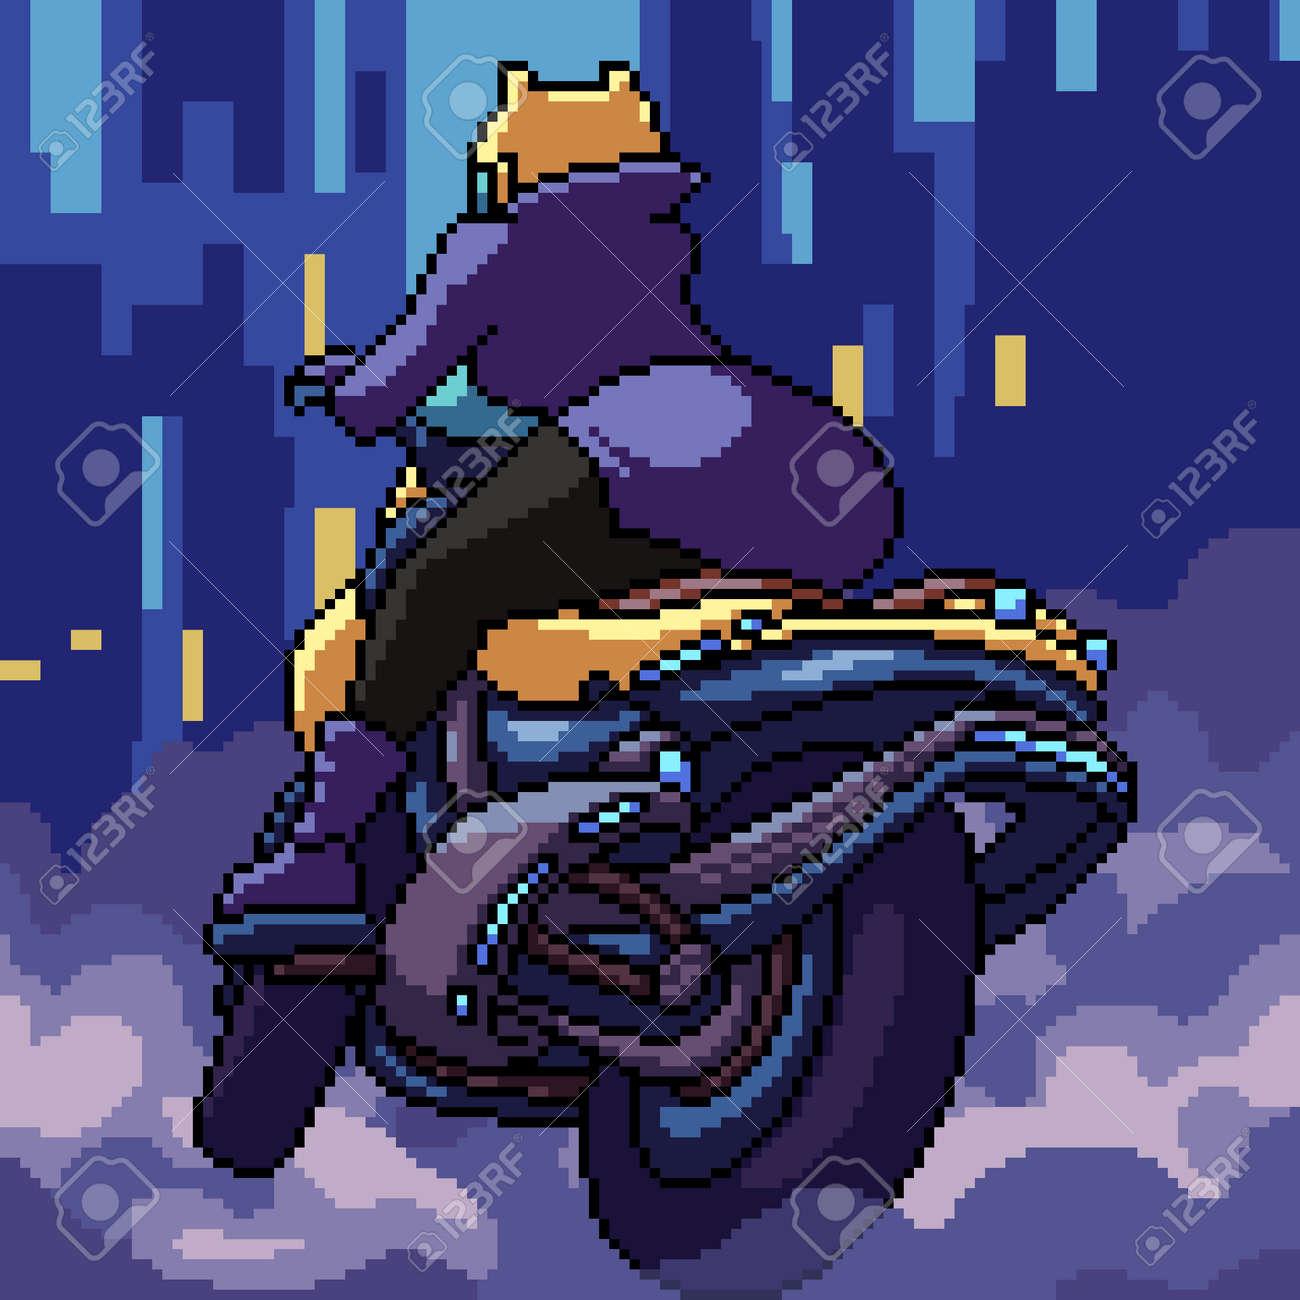 pixel art cyberpunk woman biker - 166187890